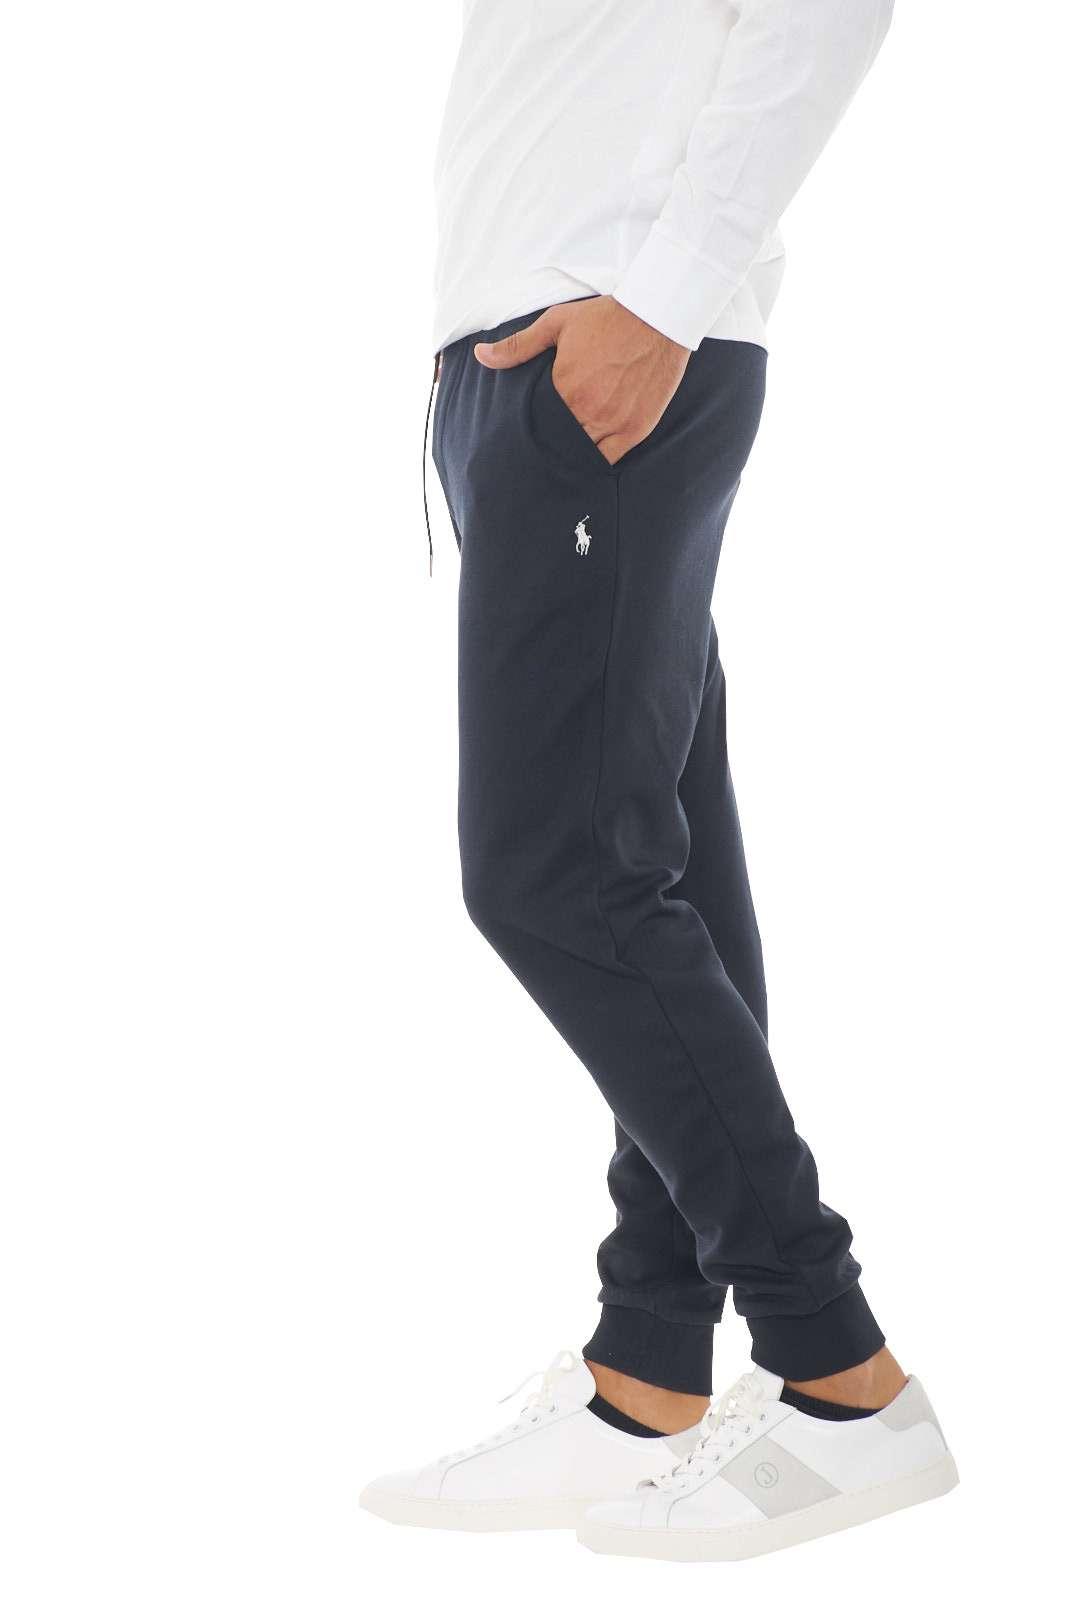 https://www.parmax.com/media/catalog/product/a/i/AI-outlet_parmax-pantaloni-uomo-Ralph-Lauren-710652314001-B_1.jpg